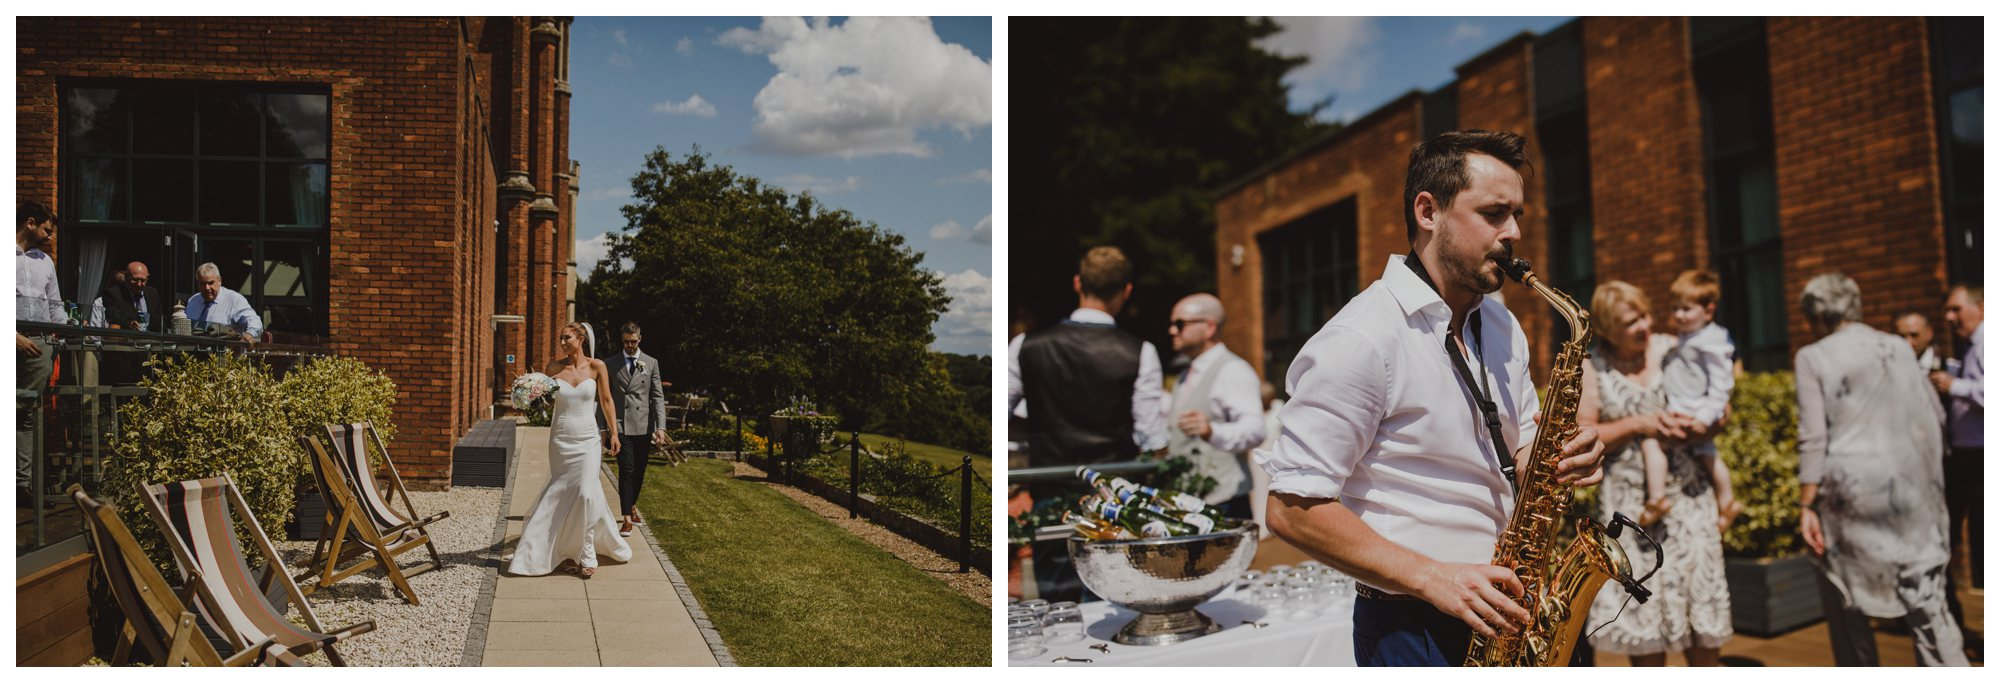 de-vere-latimer-estate-wedding-buckinghamshire_0051.jpg